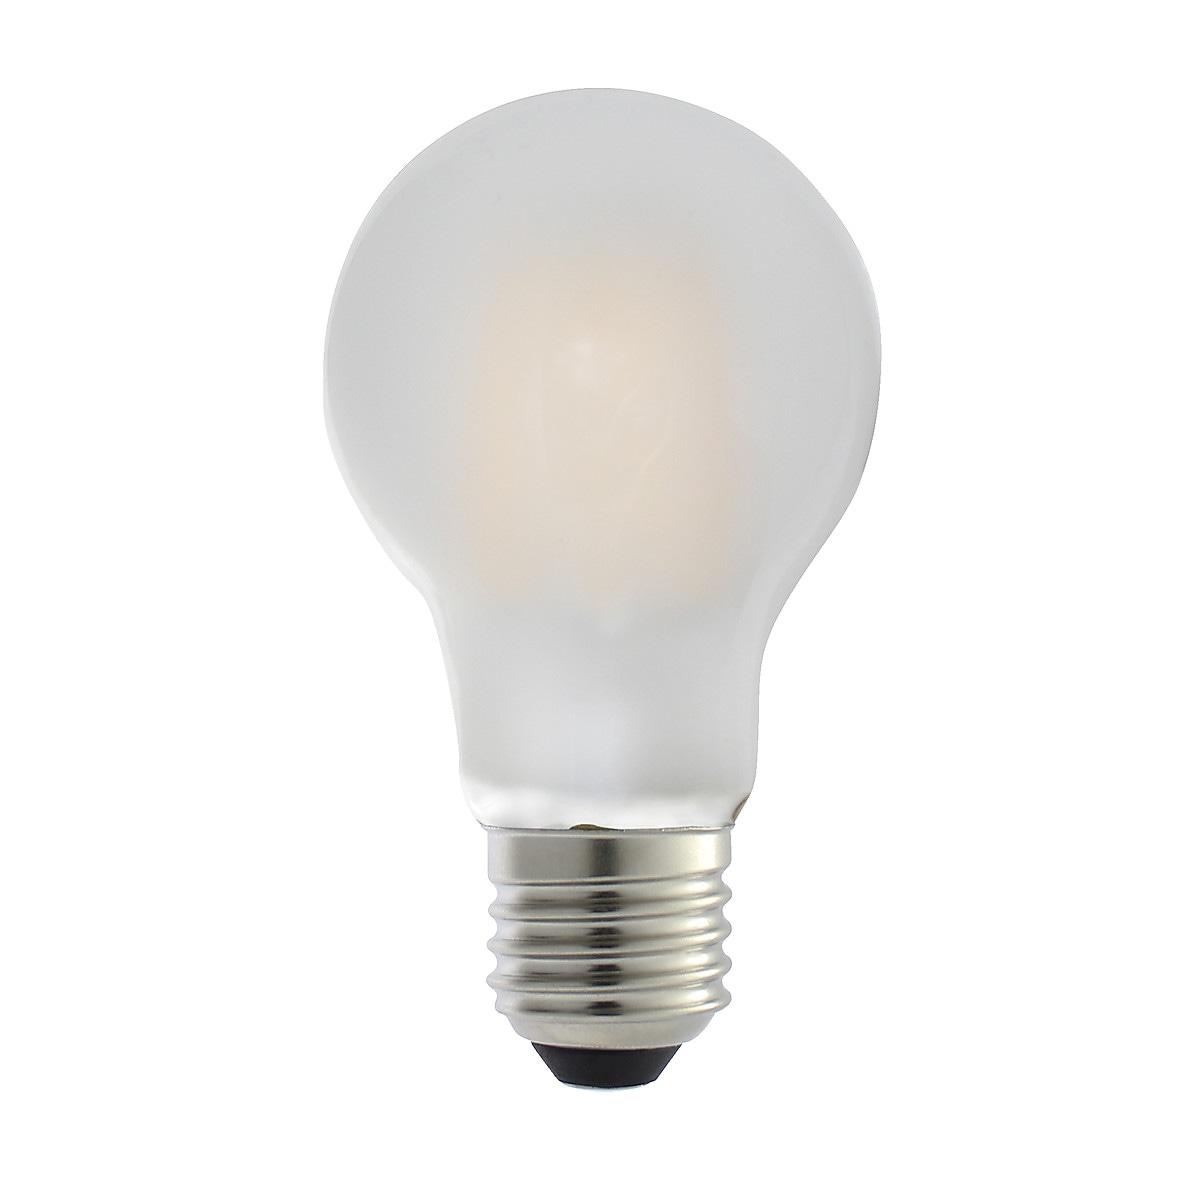 Clas Ohlson Premium Classic dimbar LED-pære E27